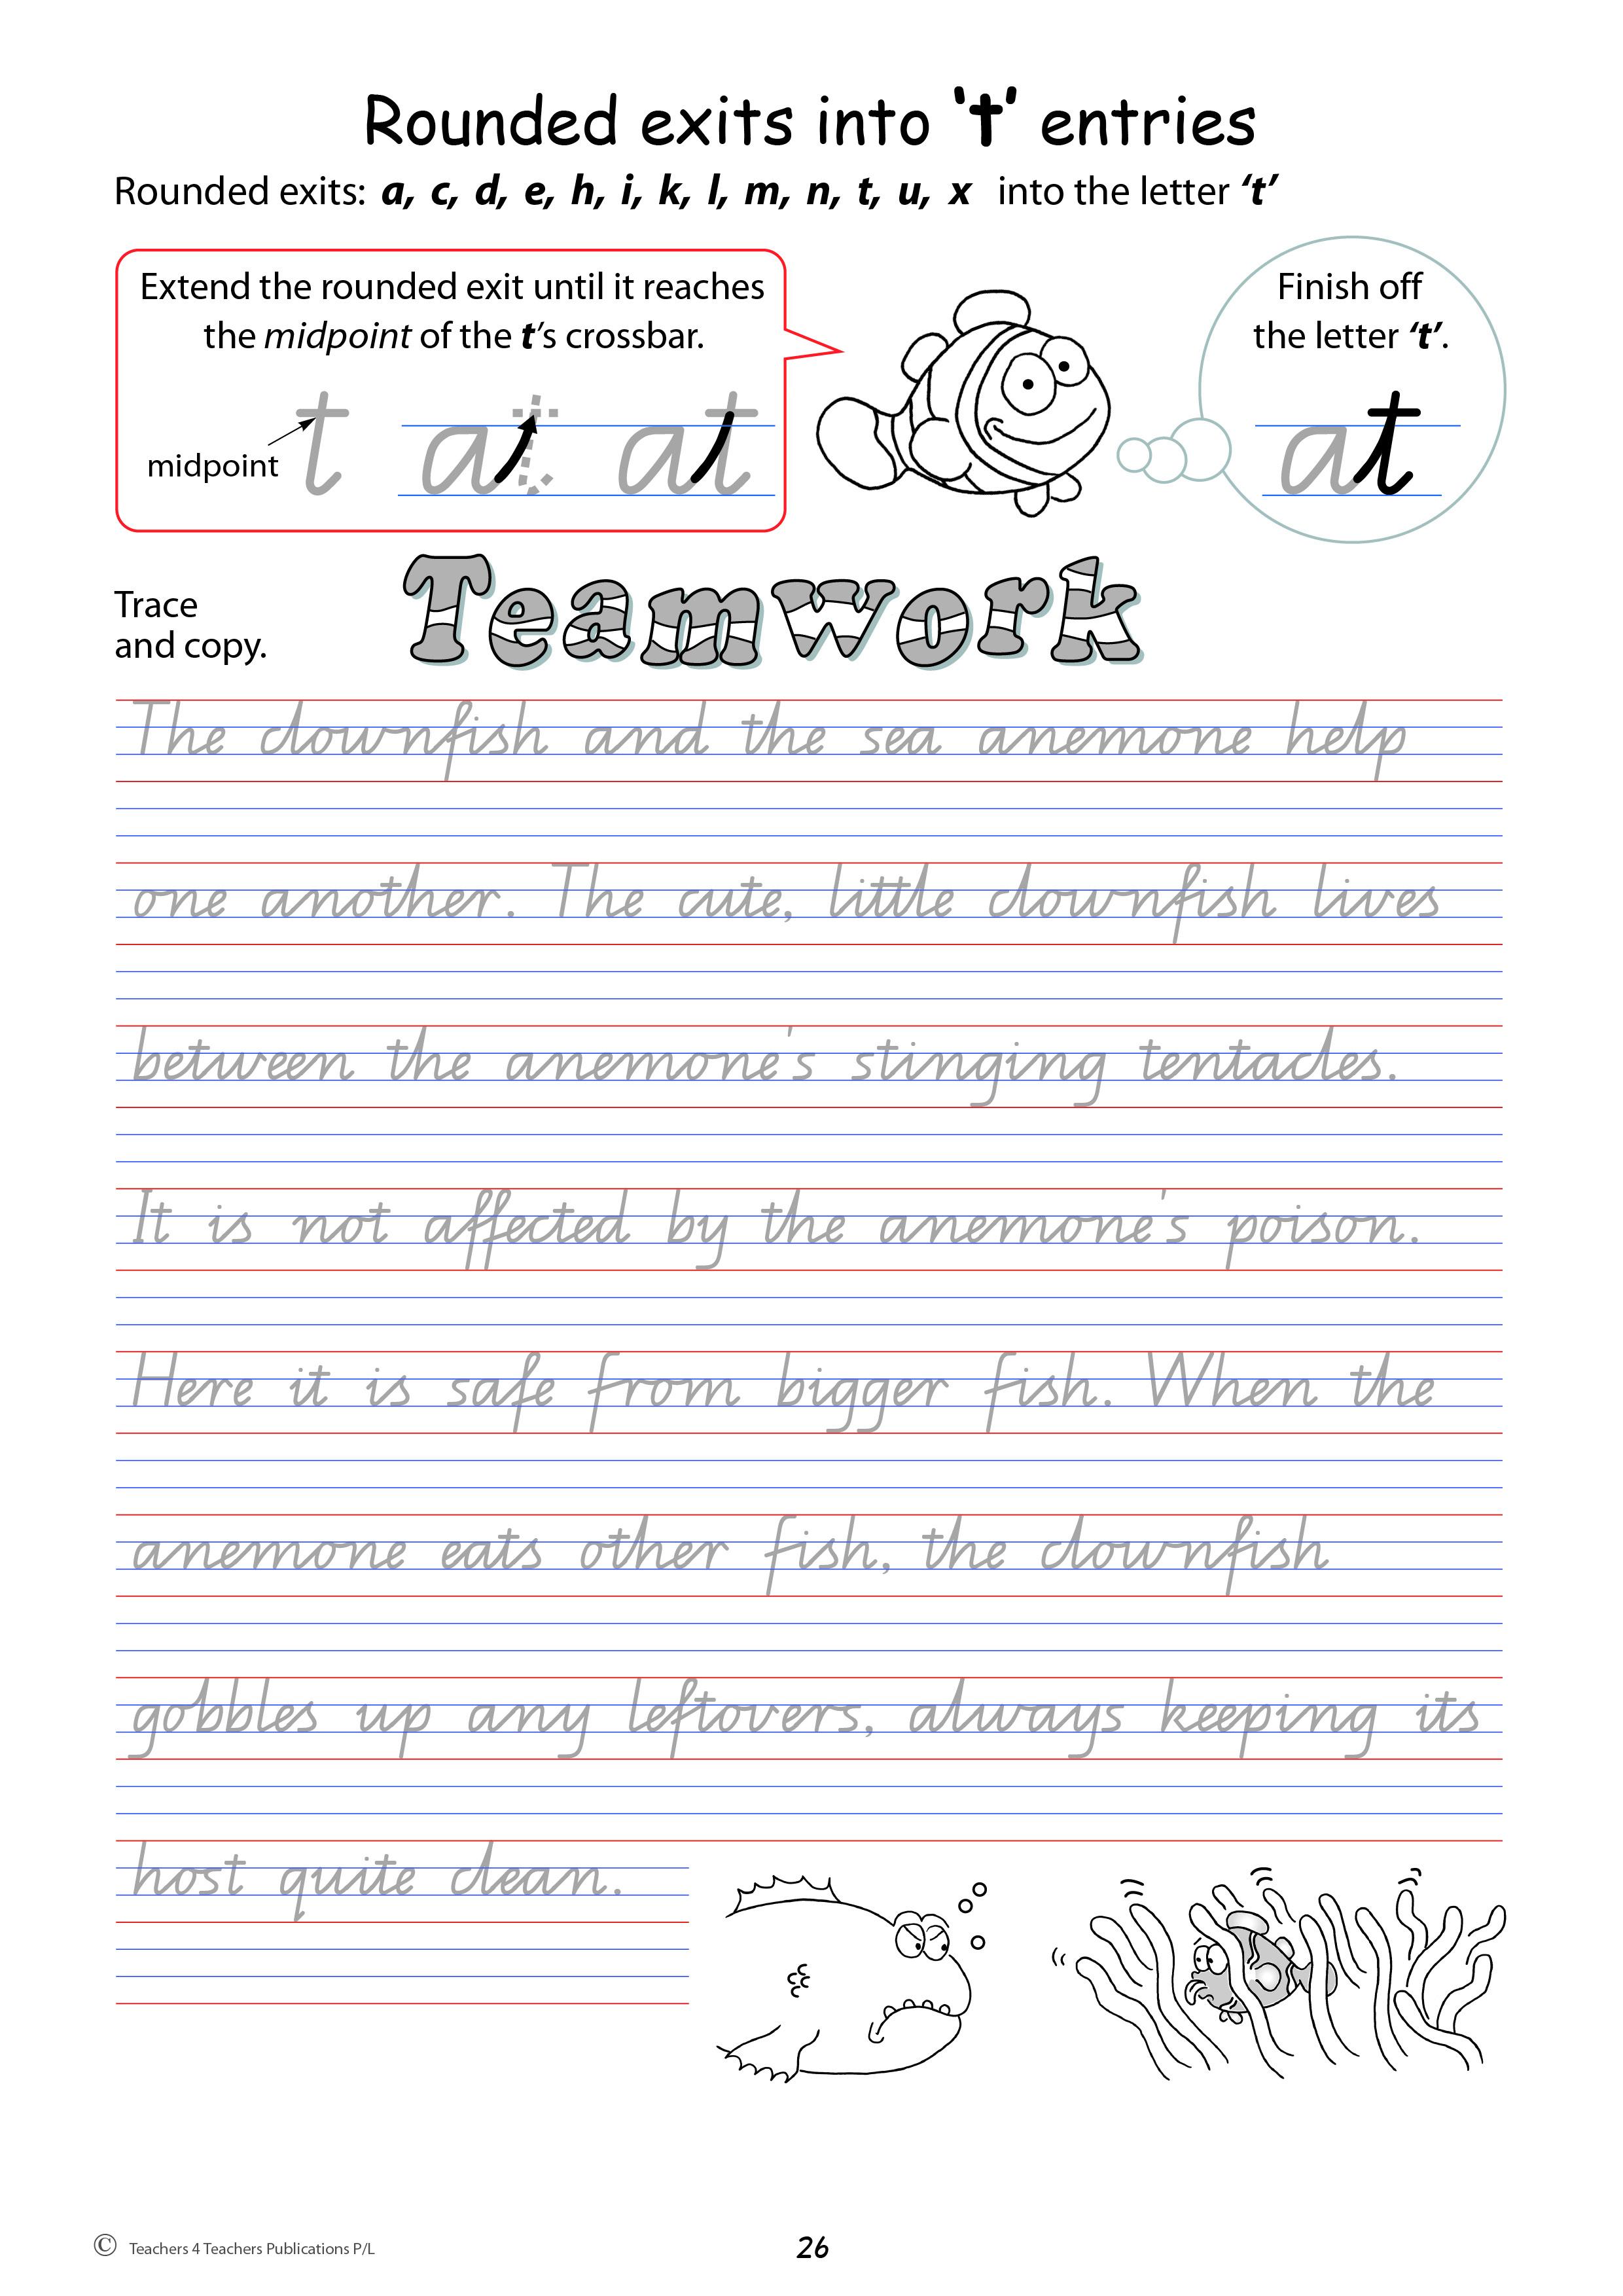 handwriting conventions queensland teachers 4 teachers publications pty ltd. Black Bedroom Furniture Sets. Home Design Ideas